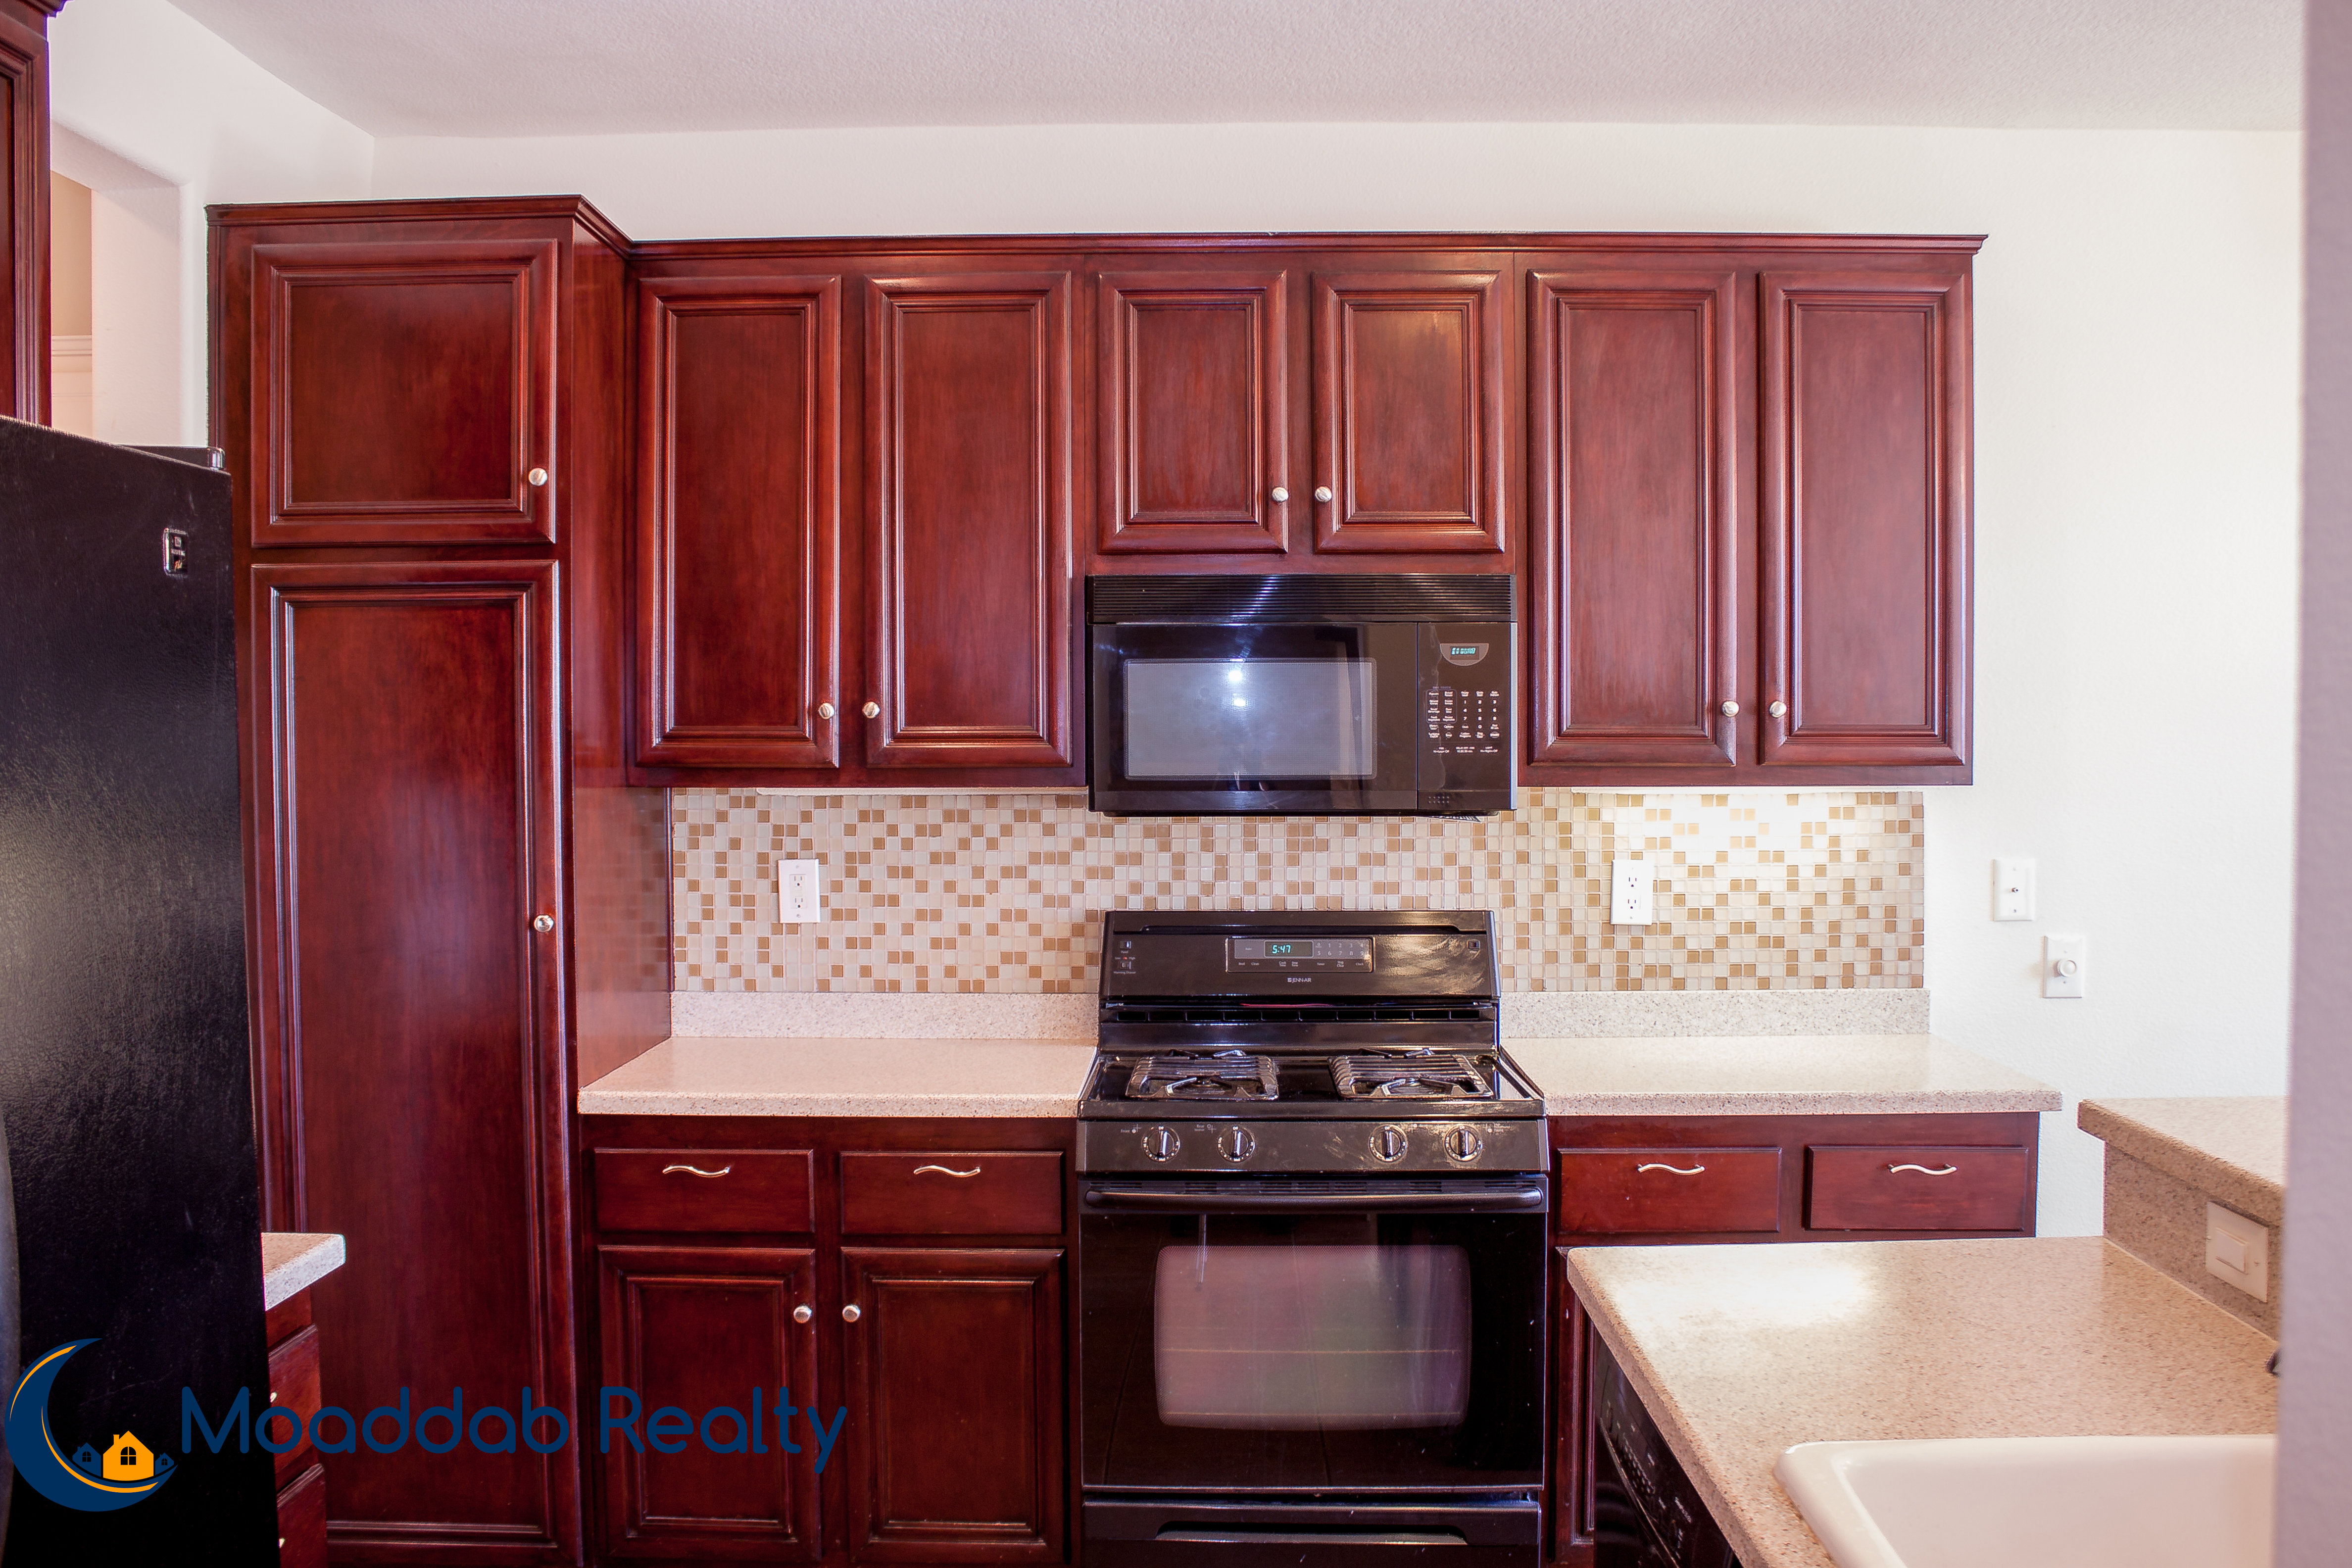 Cherry Wood Cabinets with Backsplash